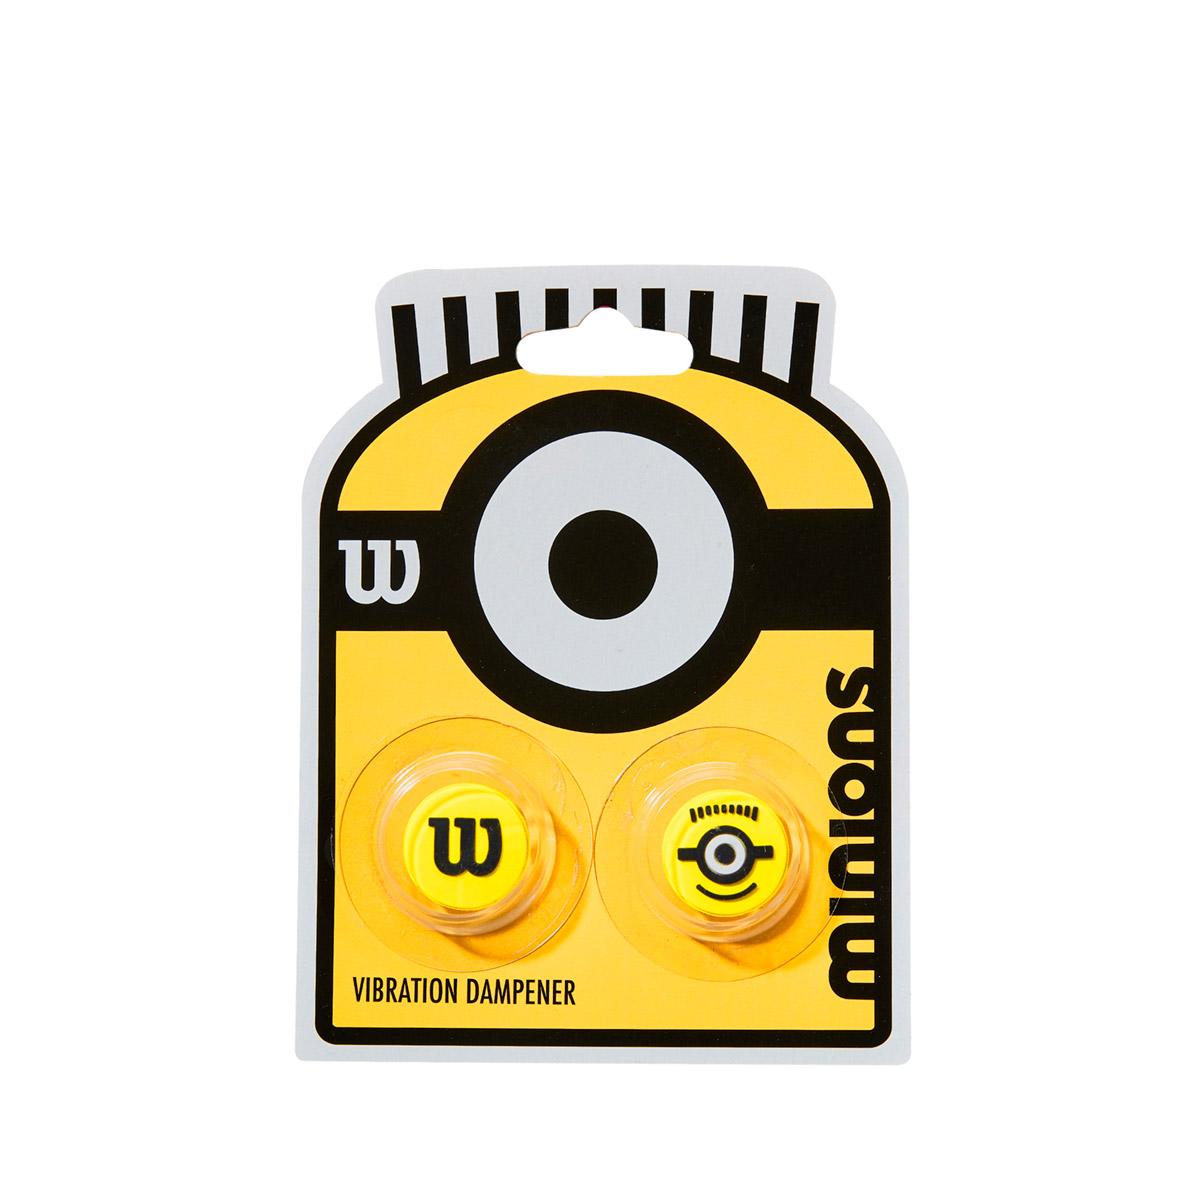 WR8408501_0_Minions_Vibration_Dampeners_2PK_YE_BL.png.cq5dam.web.2105